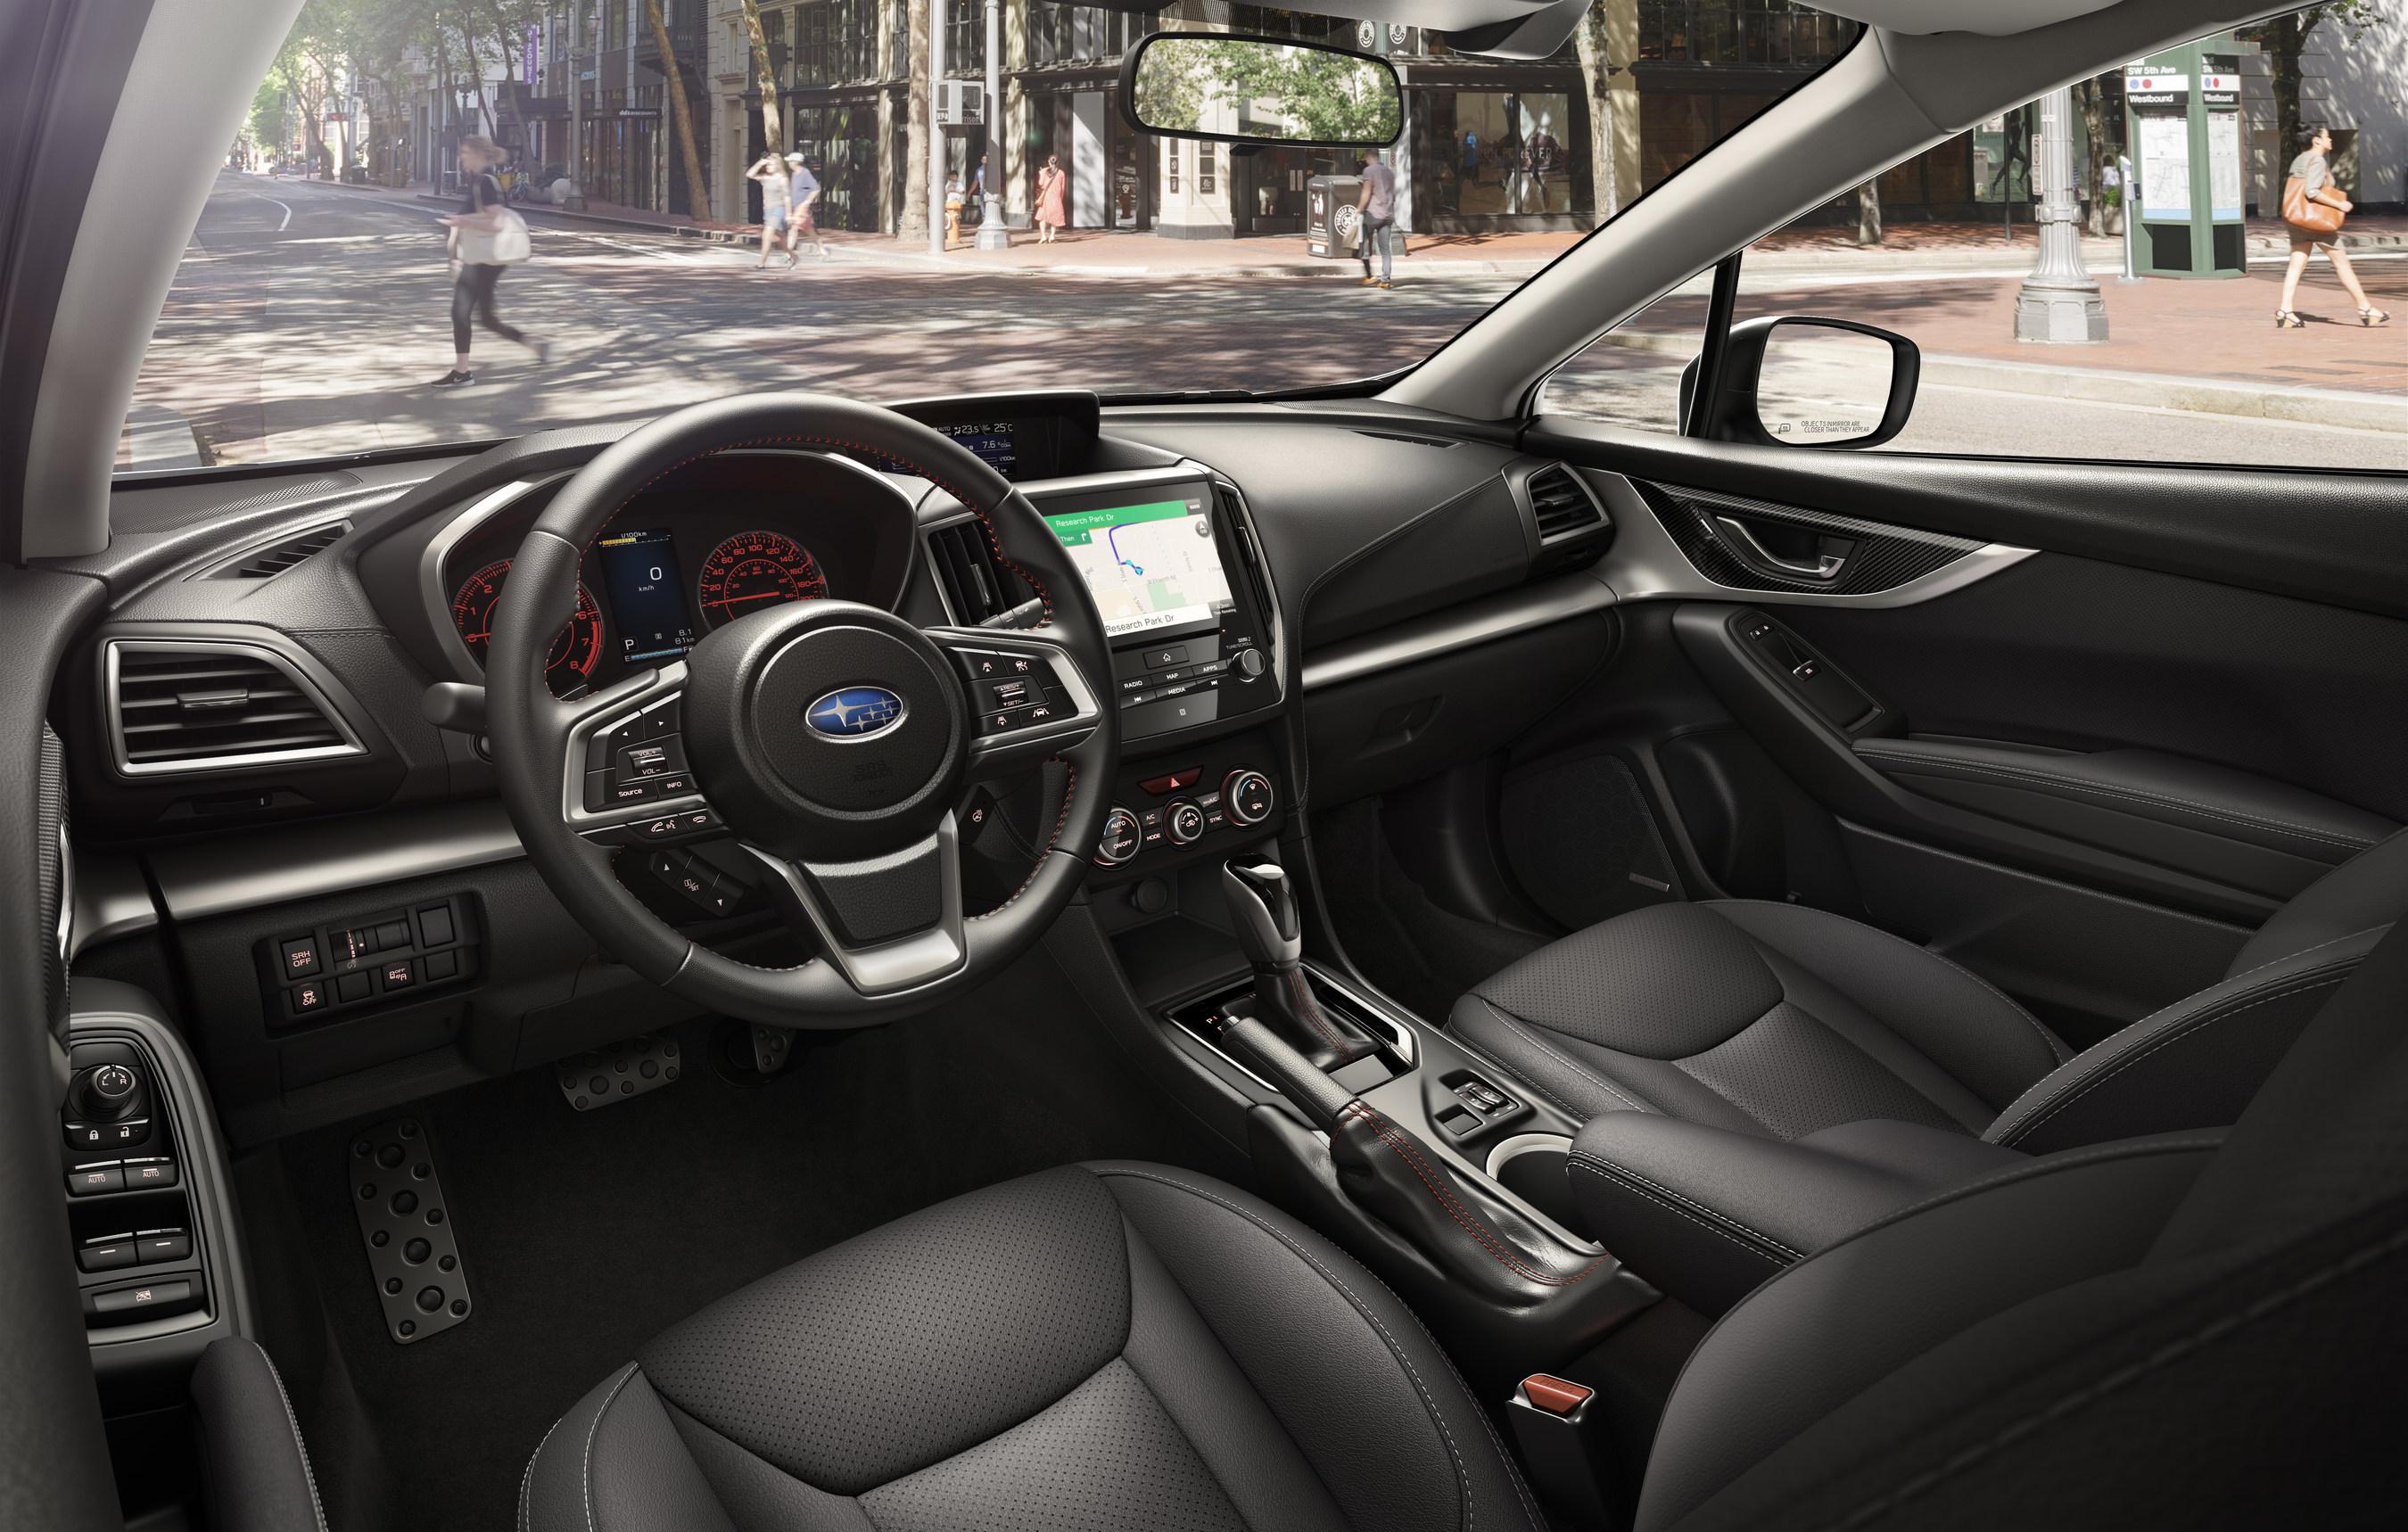 Cnw 2017 Subaru Impreza Earns Spot On Wards 10 Best Interiors List